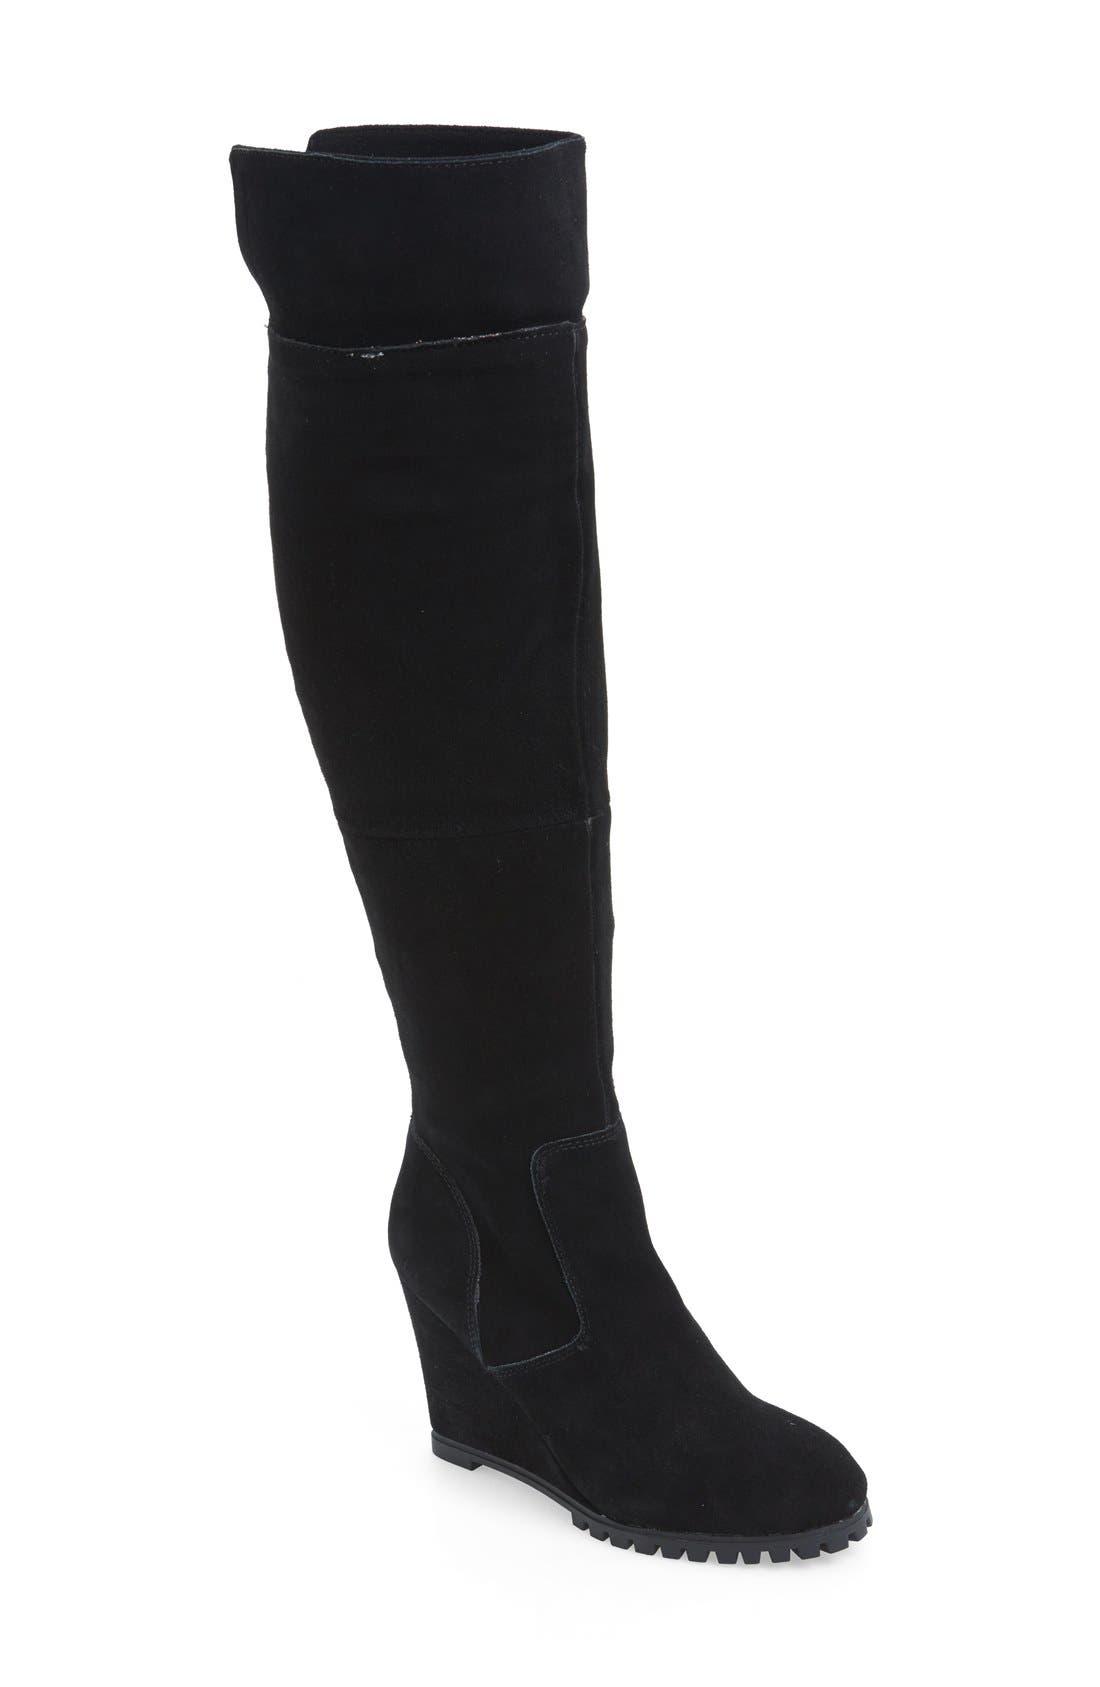 Alternate Image 1 Selected - Steve Madden 'Willful' Tall Wedge Boot (Women)